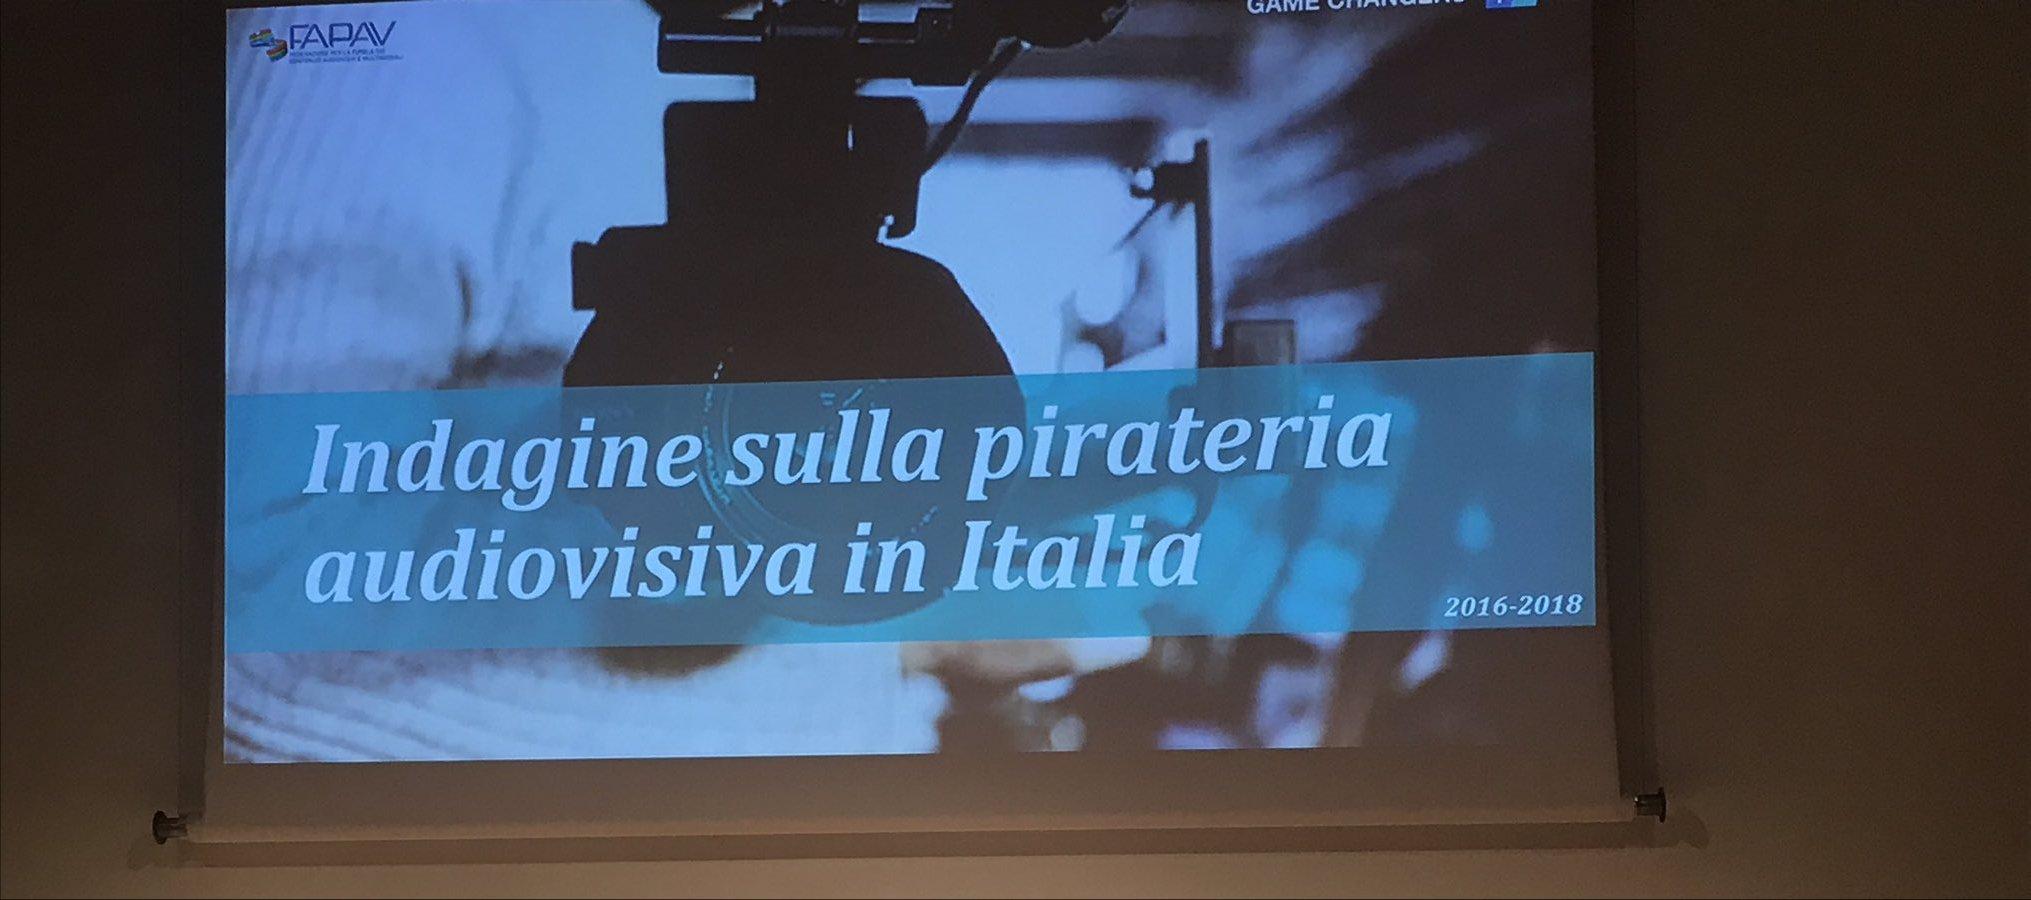 Pirateria audiovisiva in Italia, presentata la nuova ricerca FAPAV - Ipsos